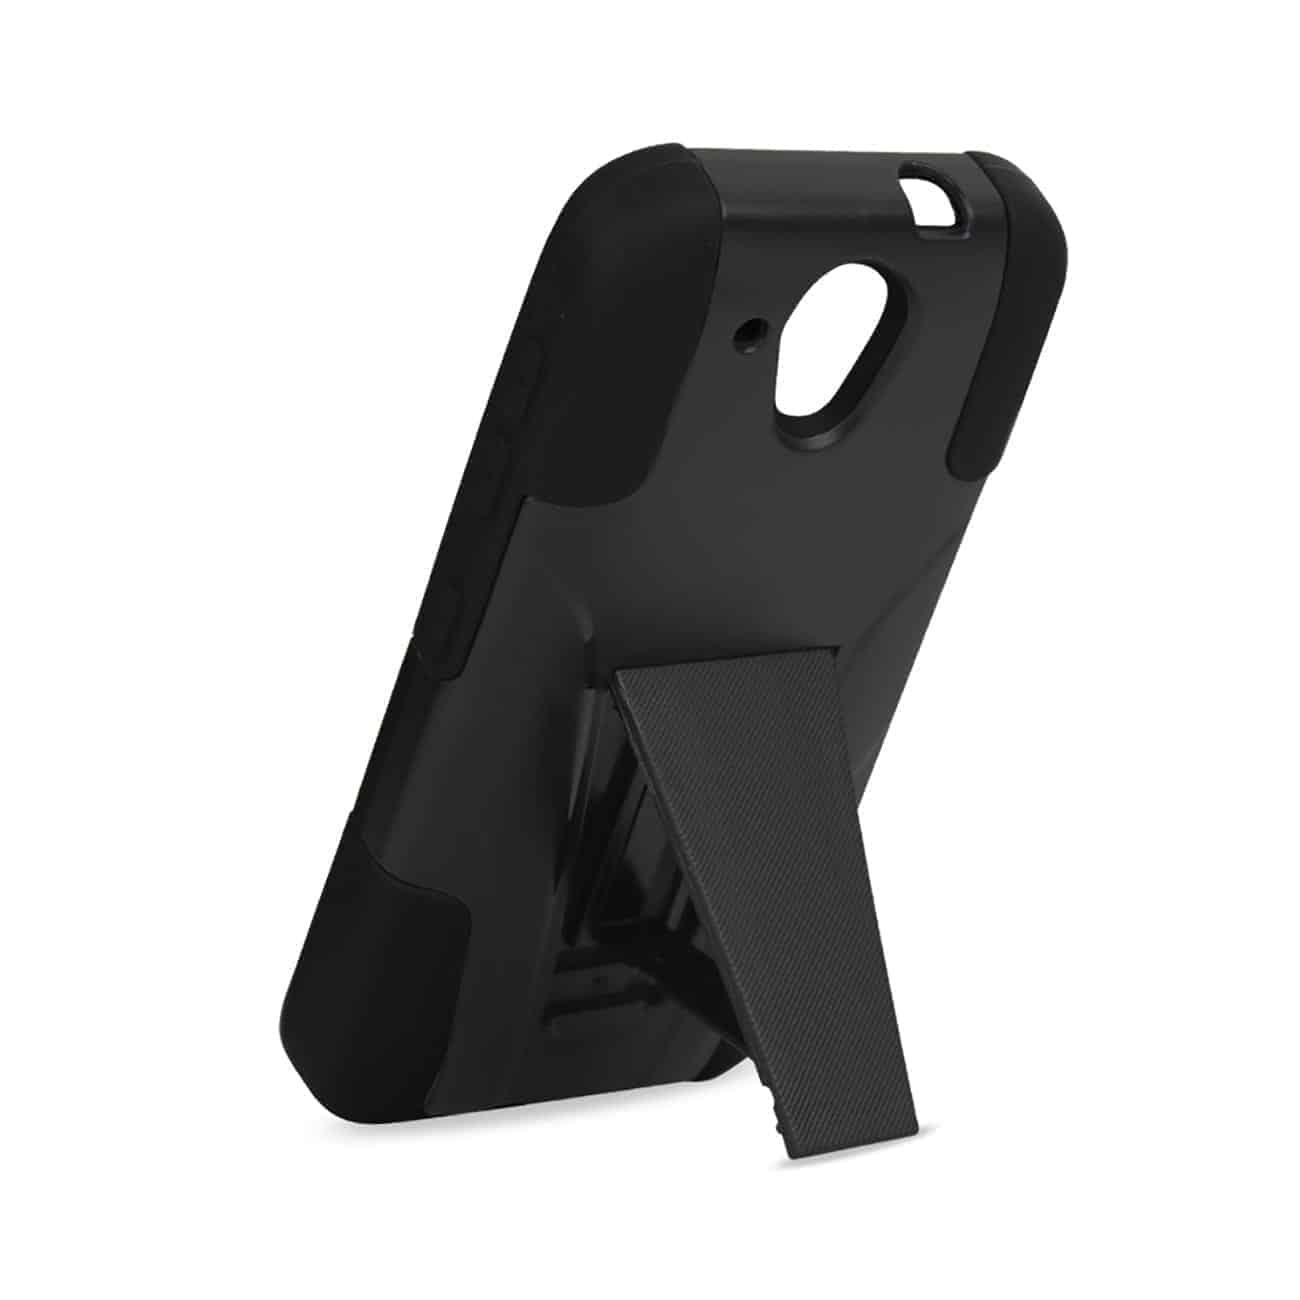 HTC DESIRE 520 HYBRID HEAVY DUTY CASE WITH KICKSTAND IN BLACK